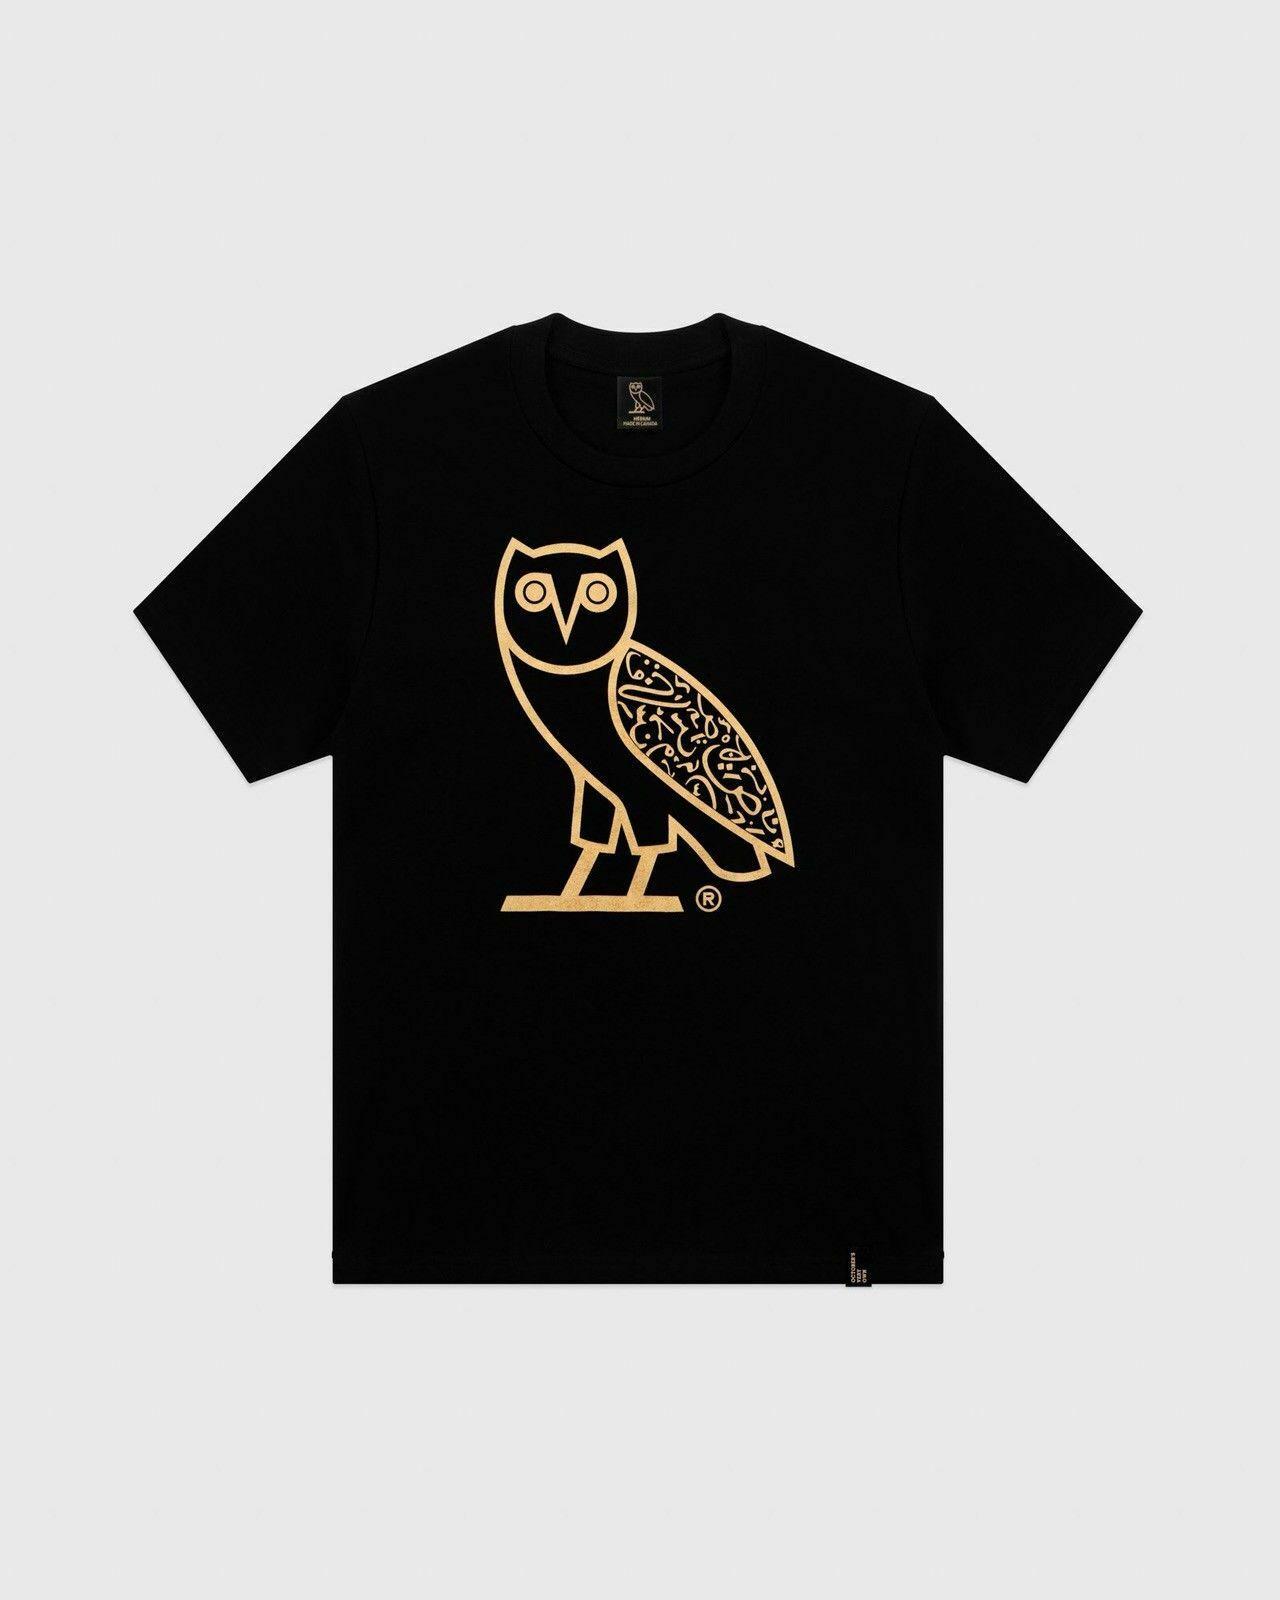 OCTOBERS VERY OWN CALLIGRAPHY   T     SHIRT   XXL 2XL BLACK, OWL, OVO, ARABIC, DRAKE 2019 New 100% Cotton   T  -  Shirts   Men